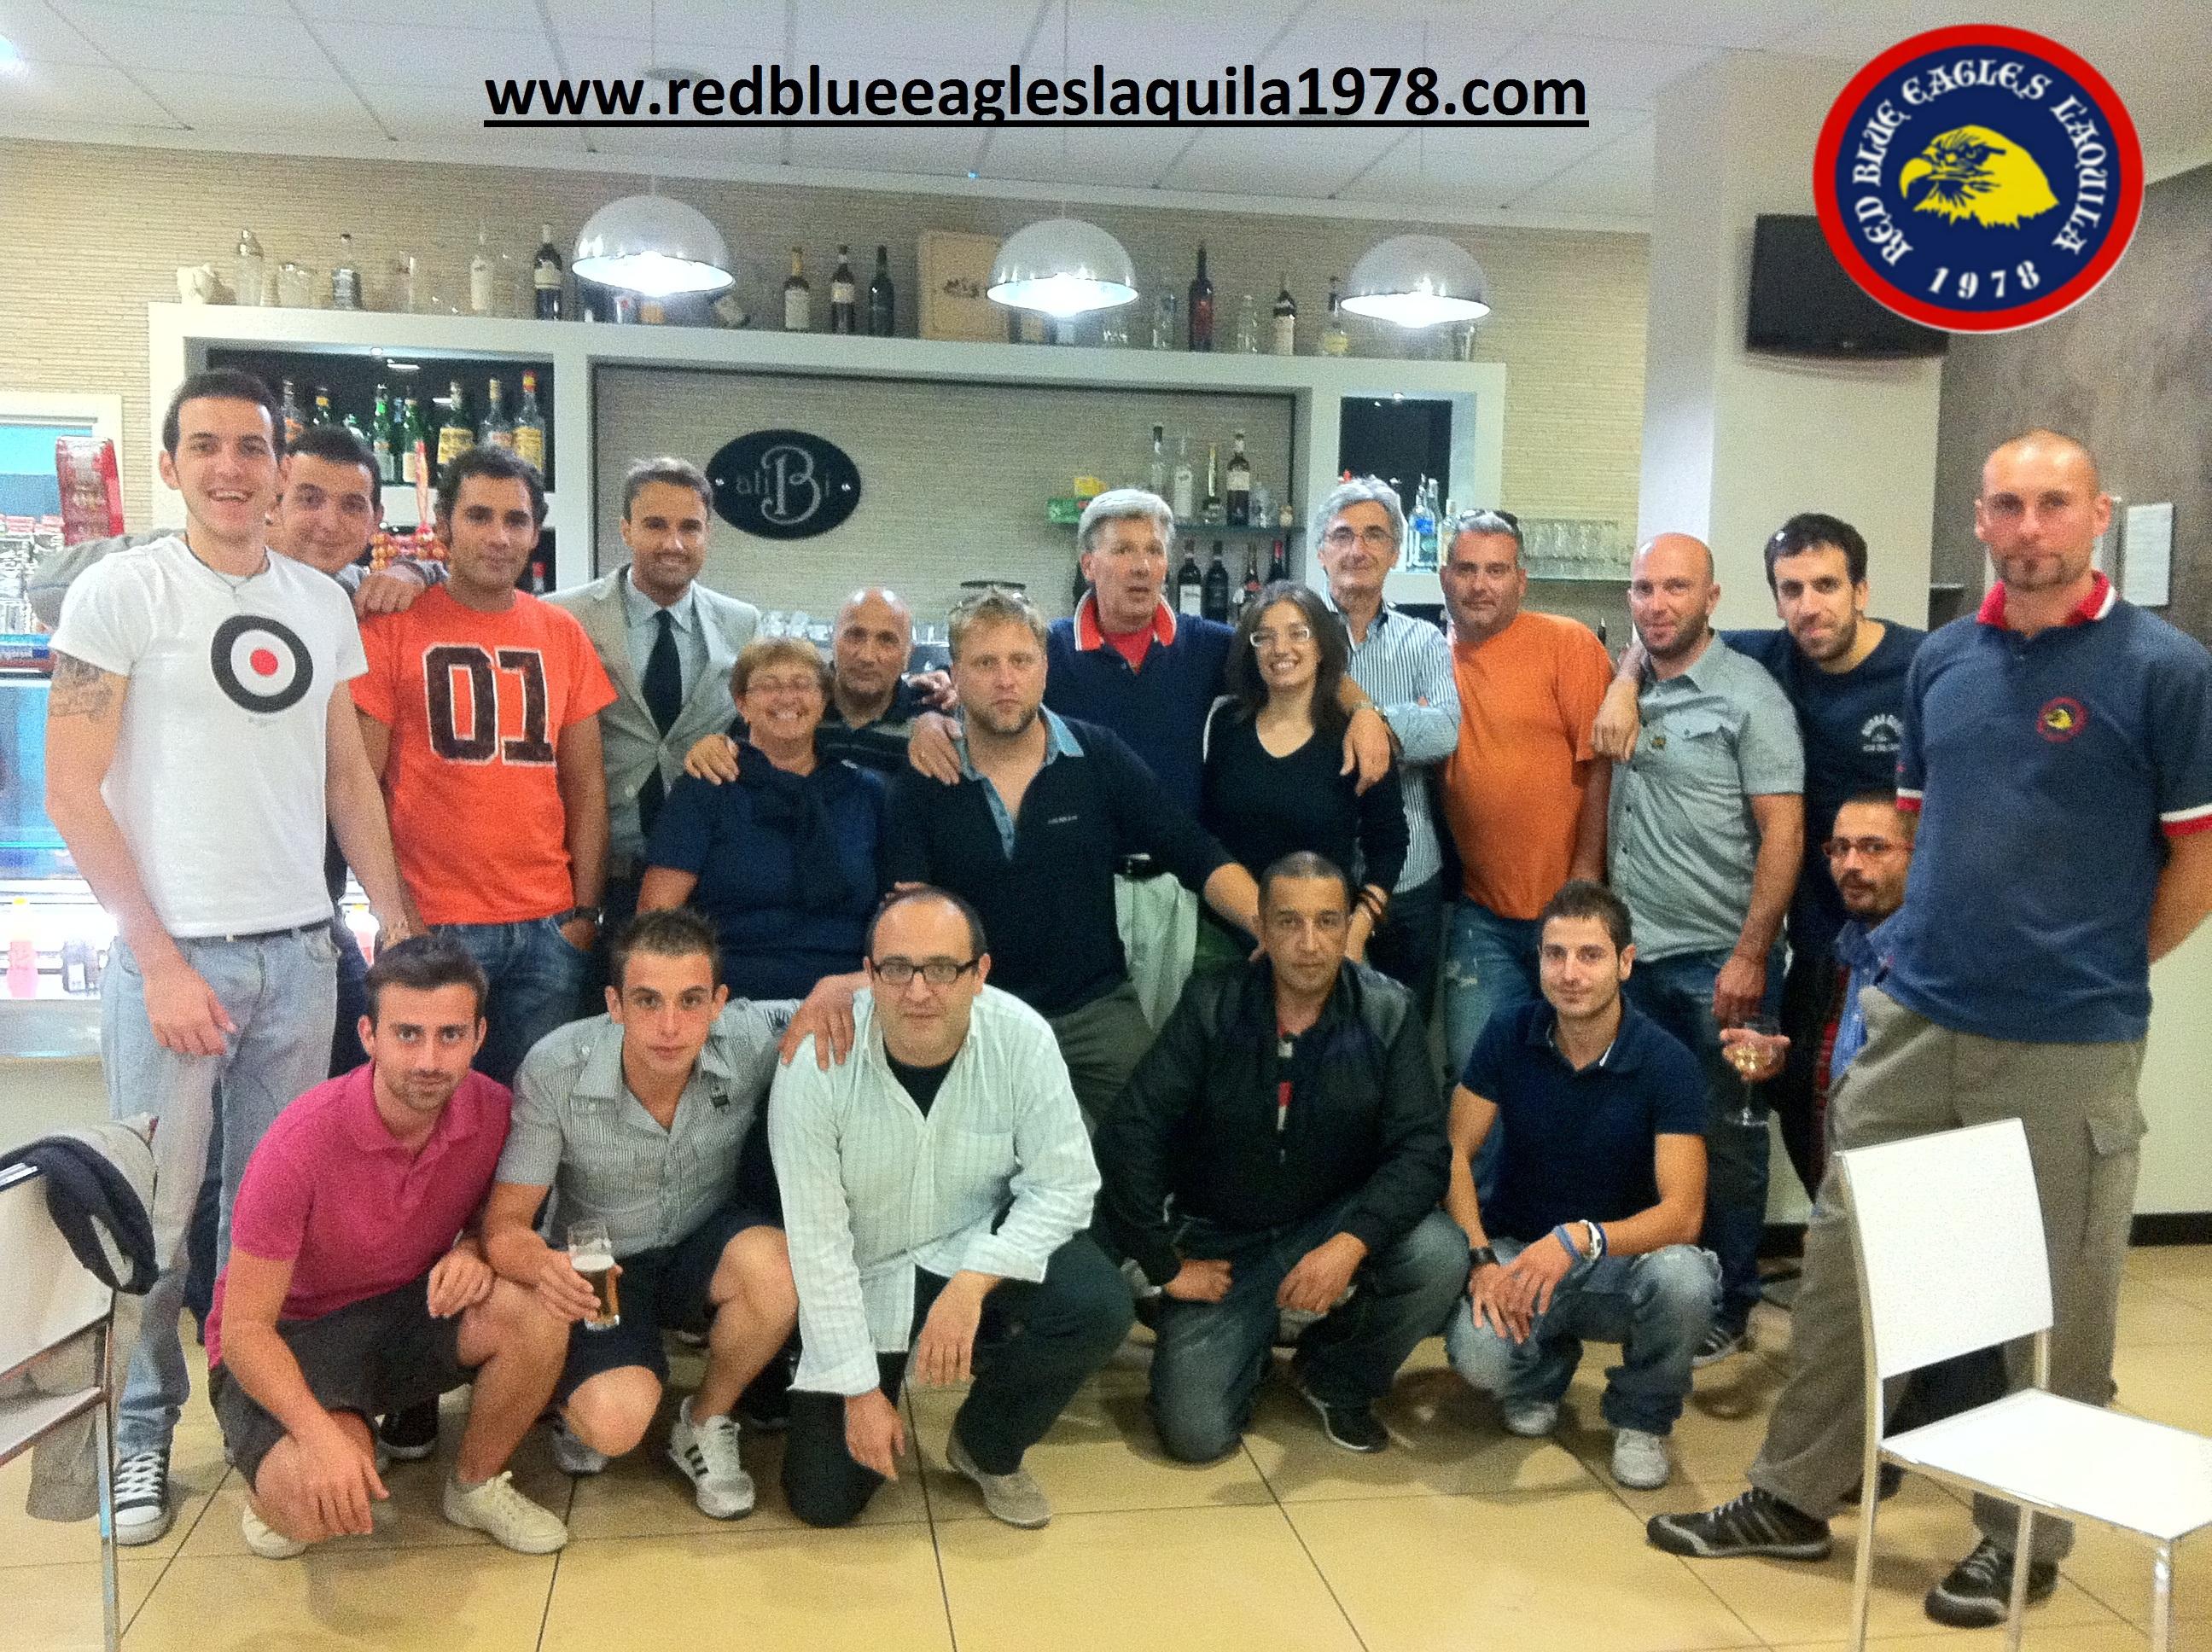 Serata di solidarietà per Ahikic